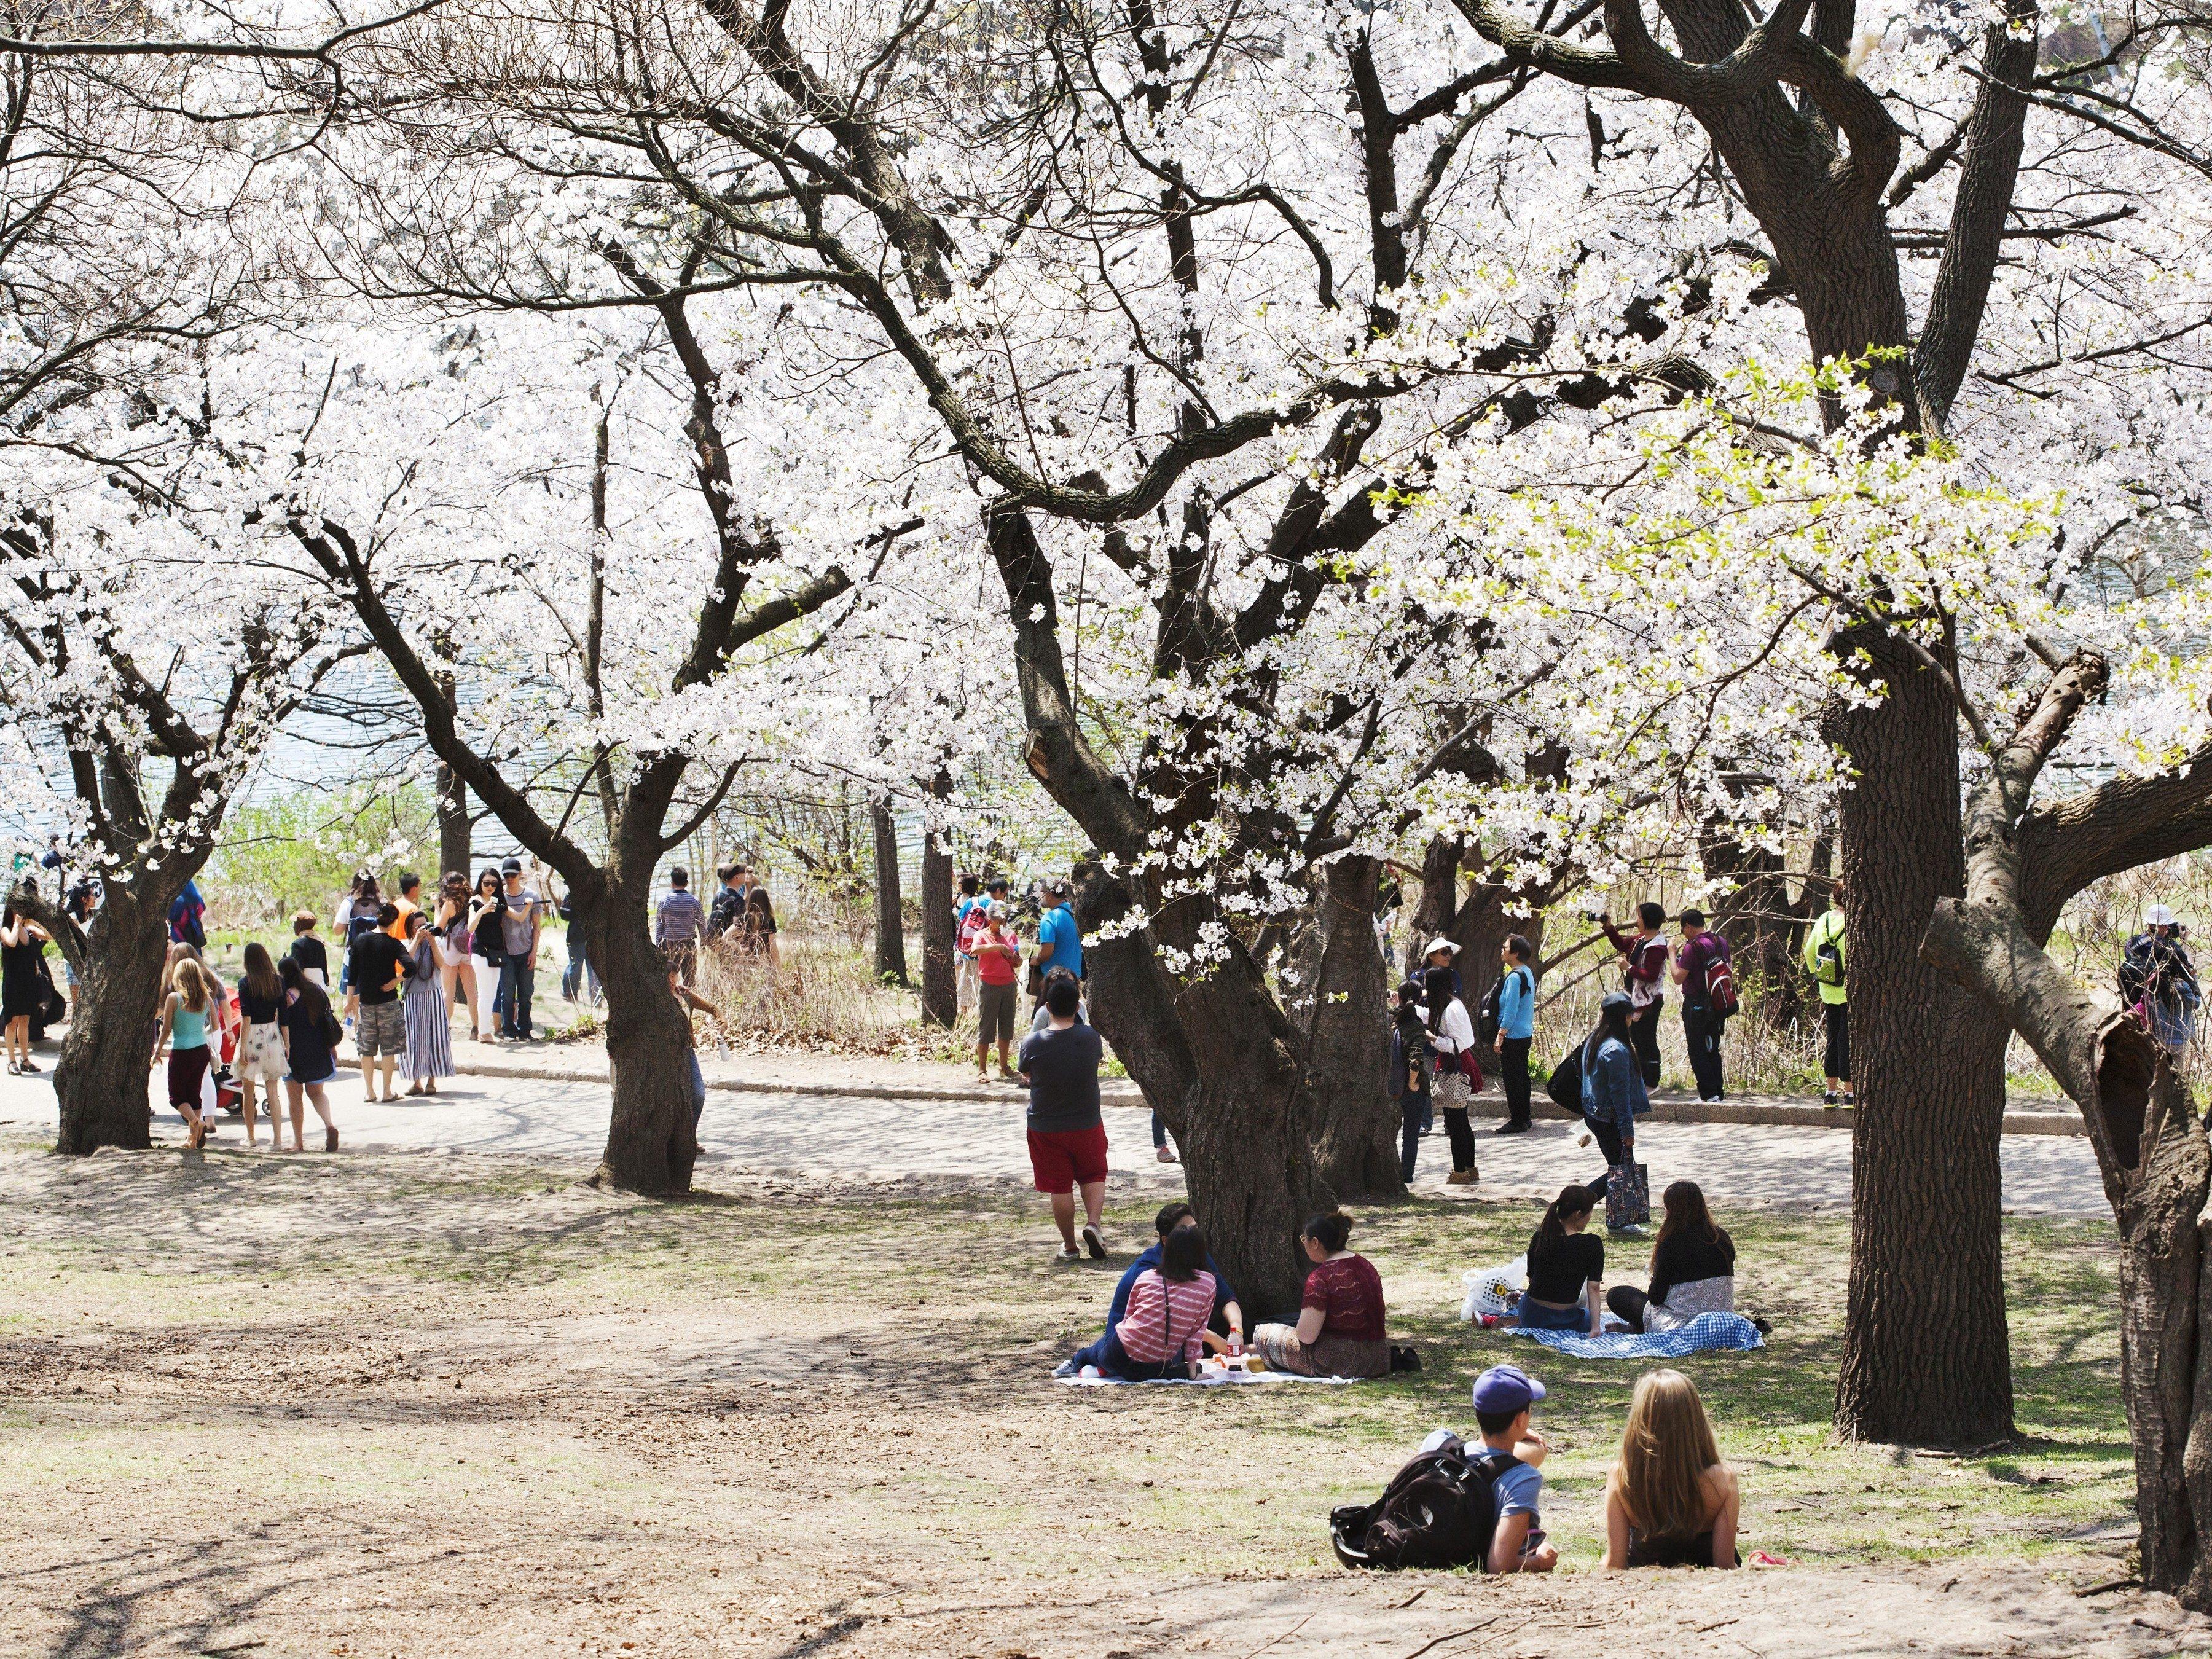 9. High Park's cherry blossoms